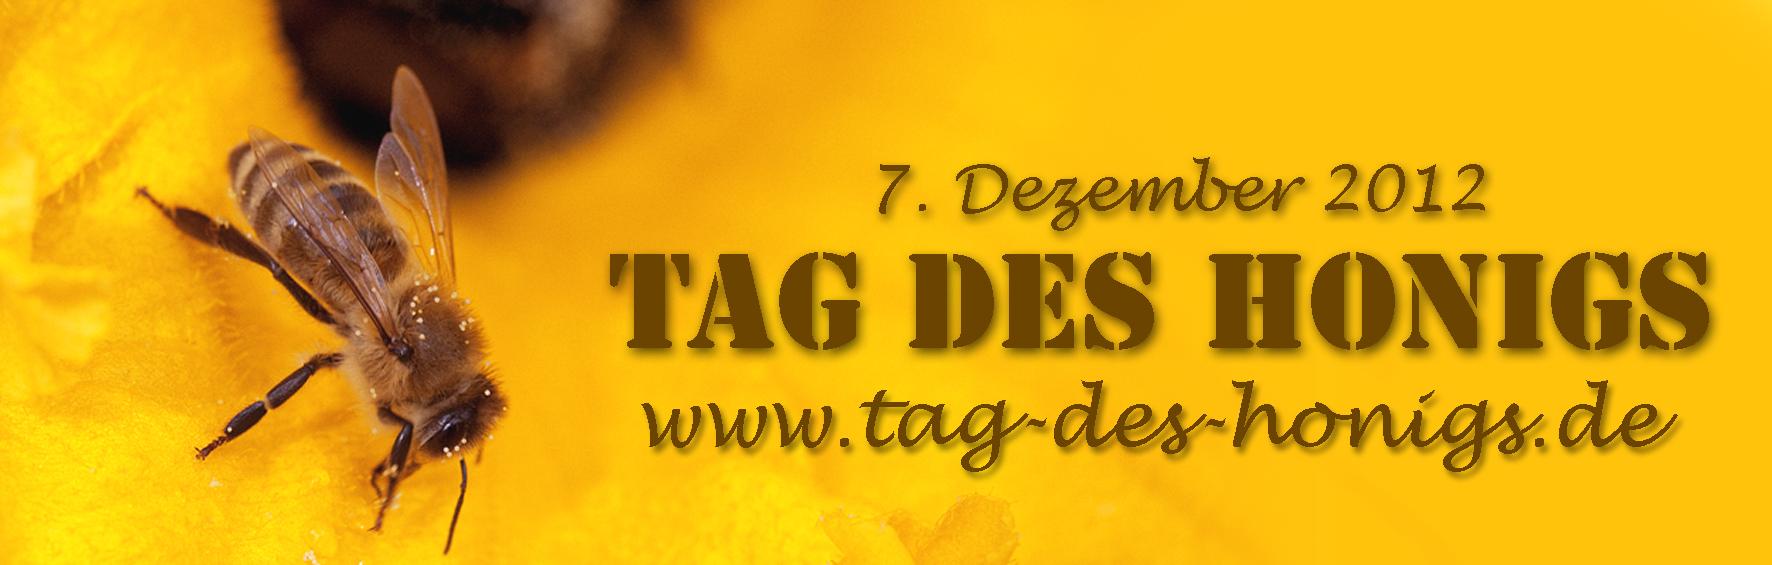 21. Internationaler Tag des Honigs am 7. Dezember 2012